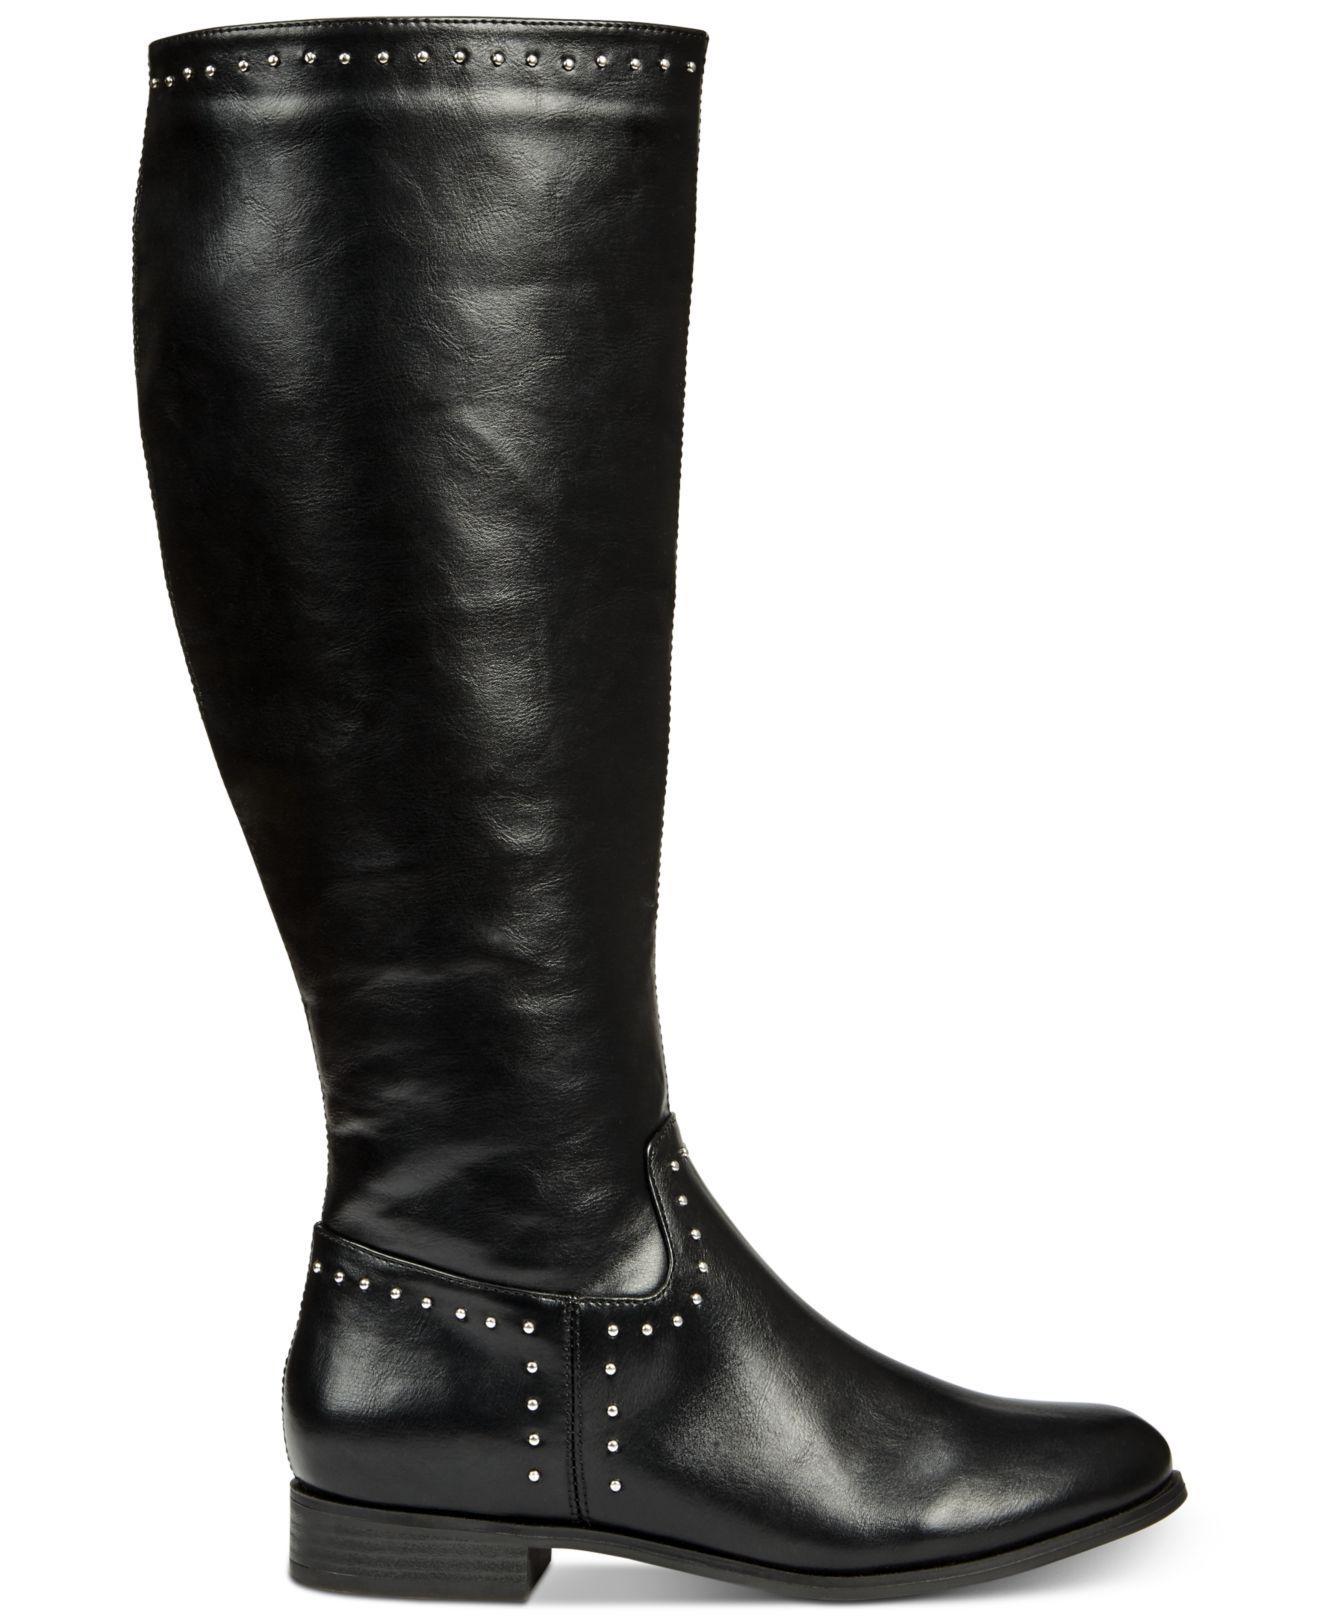 811facf282e7 Lyst - Esprit Genie Memory Foam Studded Riding Boots in Black